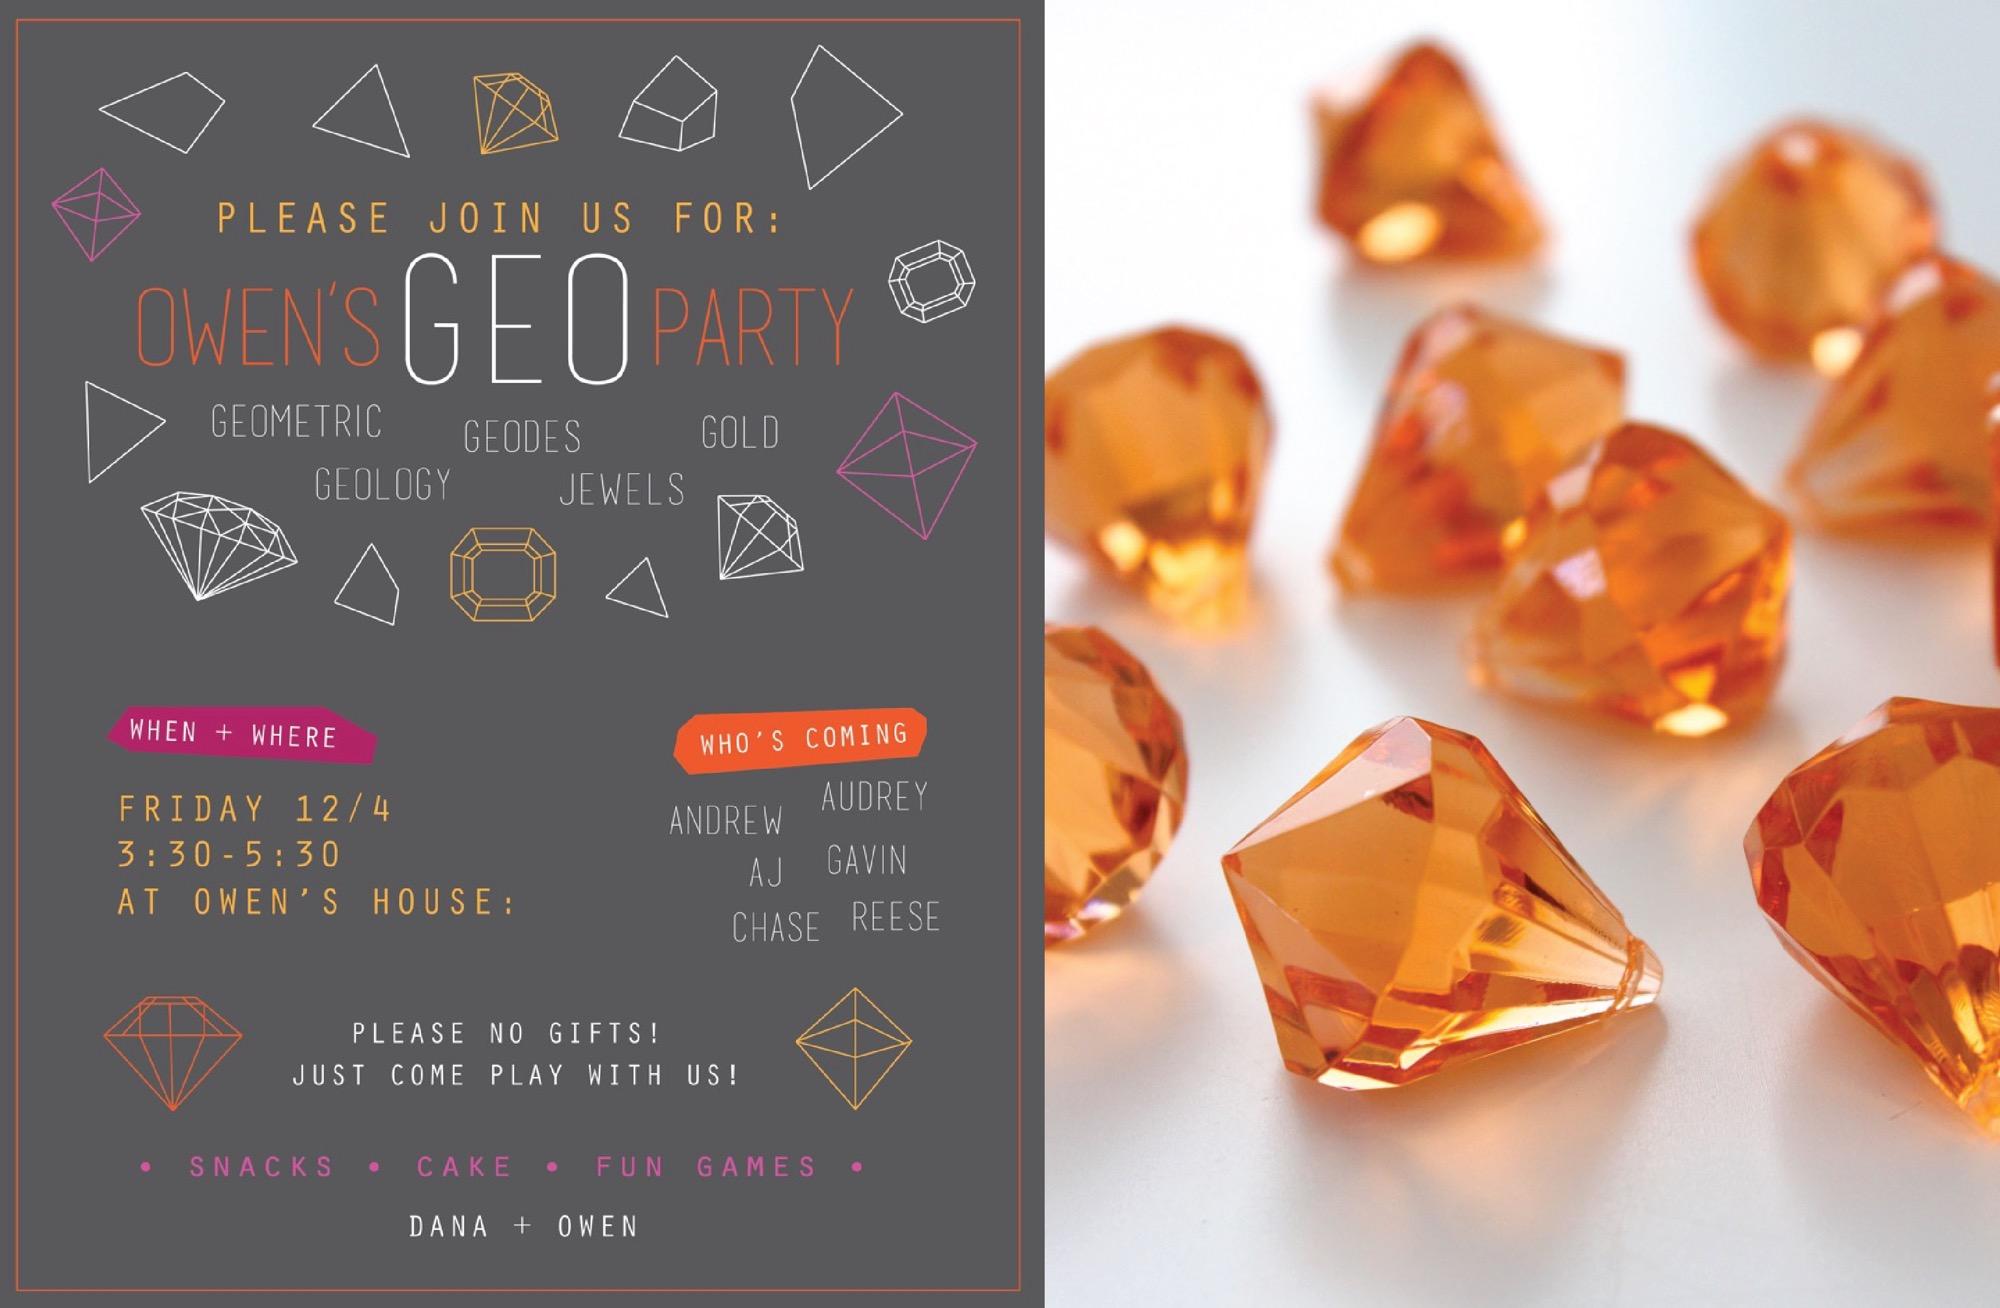 GEO party invitation owen's geo birthday party made everyday,Geology Birthday Party Invitations